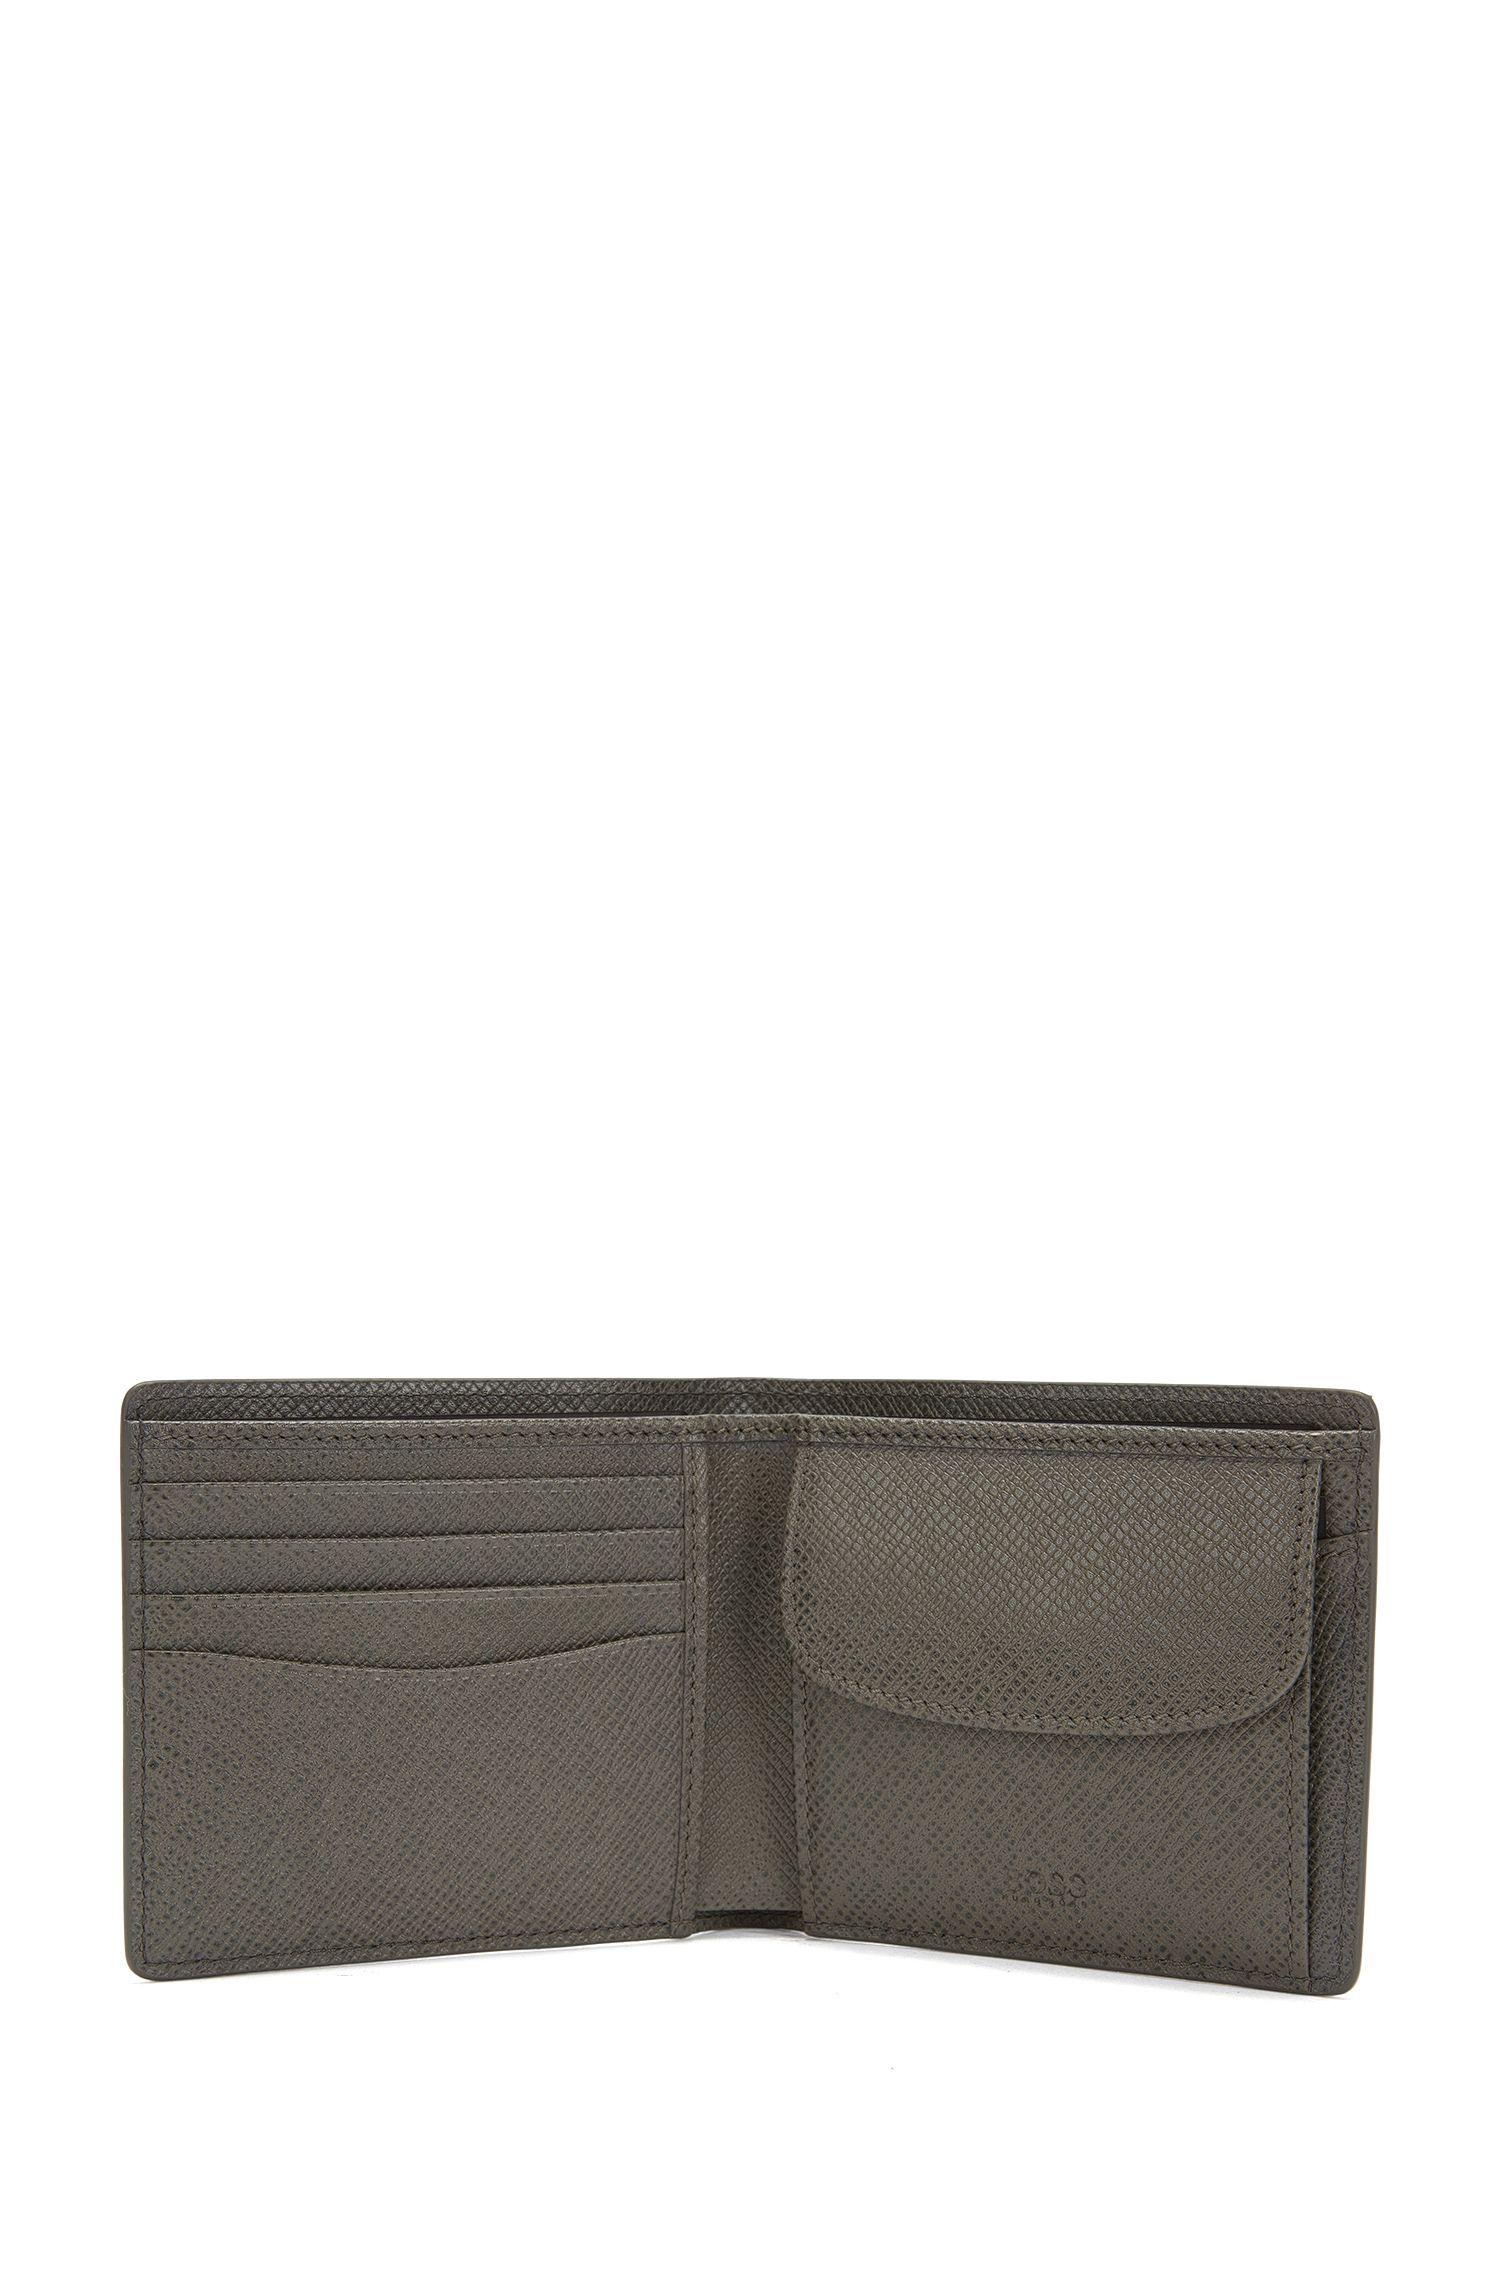 Calfskin Pebbled Wallet | Signature Coin, Dark Grey